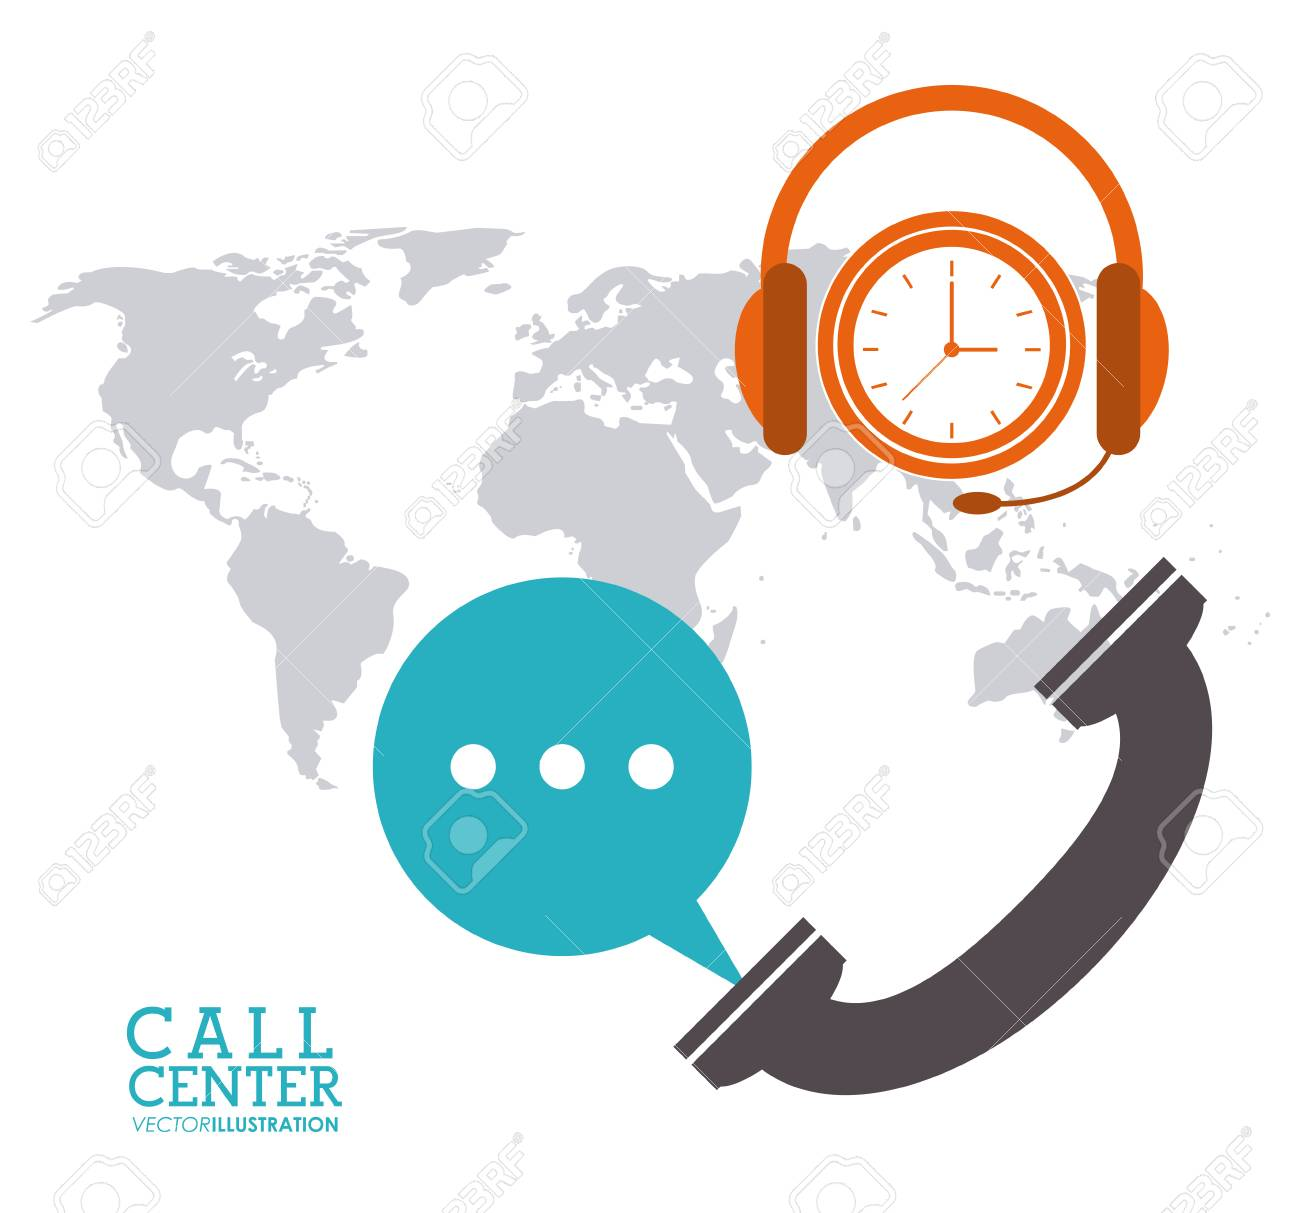 Phone bubble headphone clock map call center technical service phone bubble headphone clock map call center technical service icon vector illustration stock vector publicscrutiny Gallery